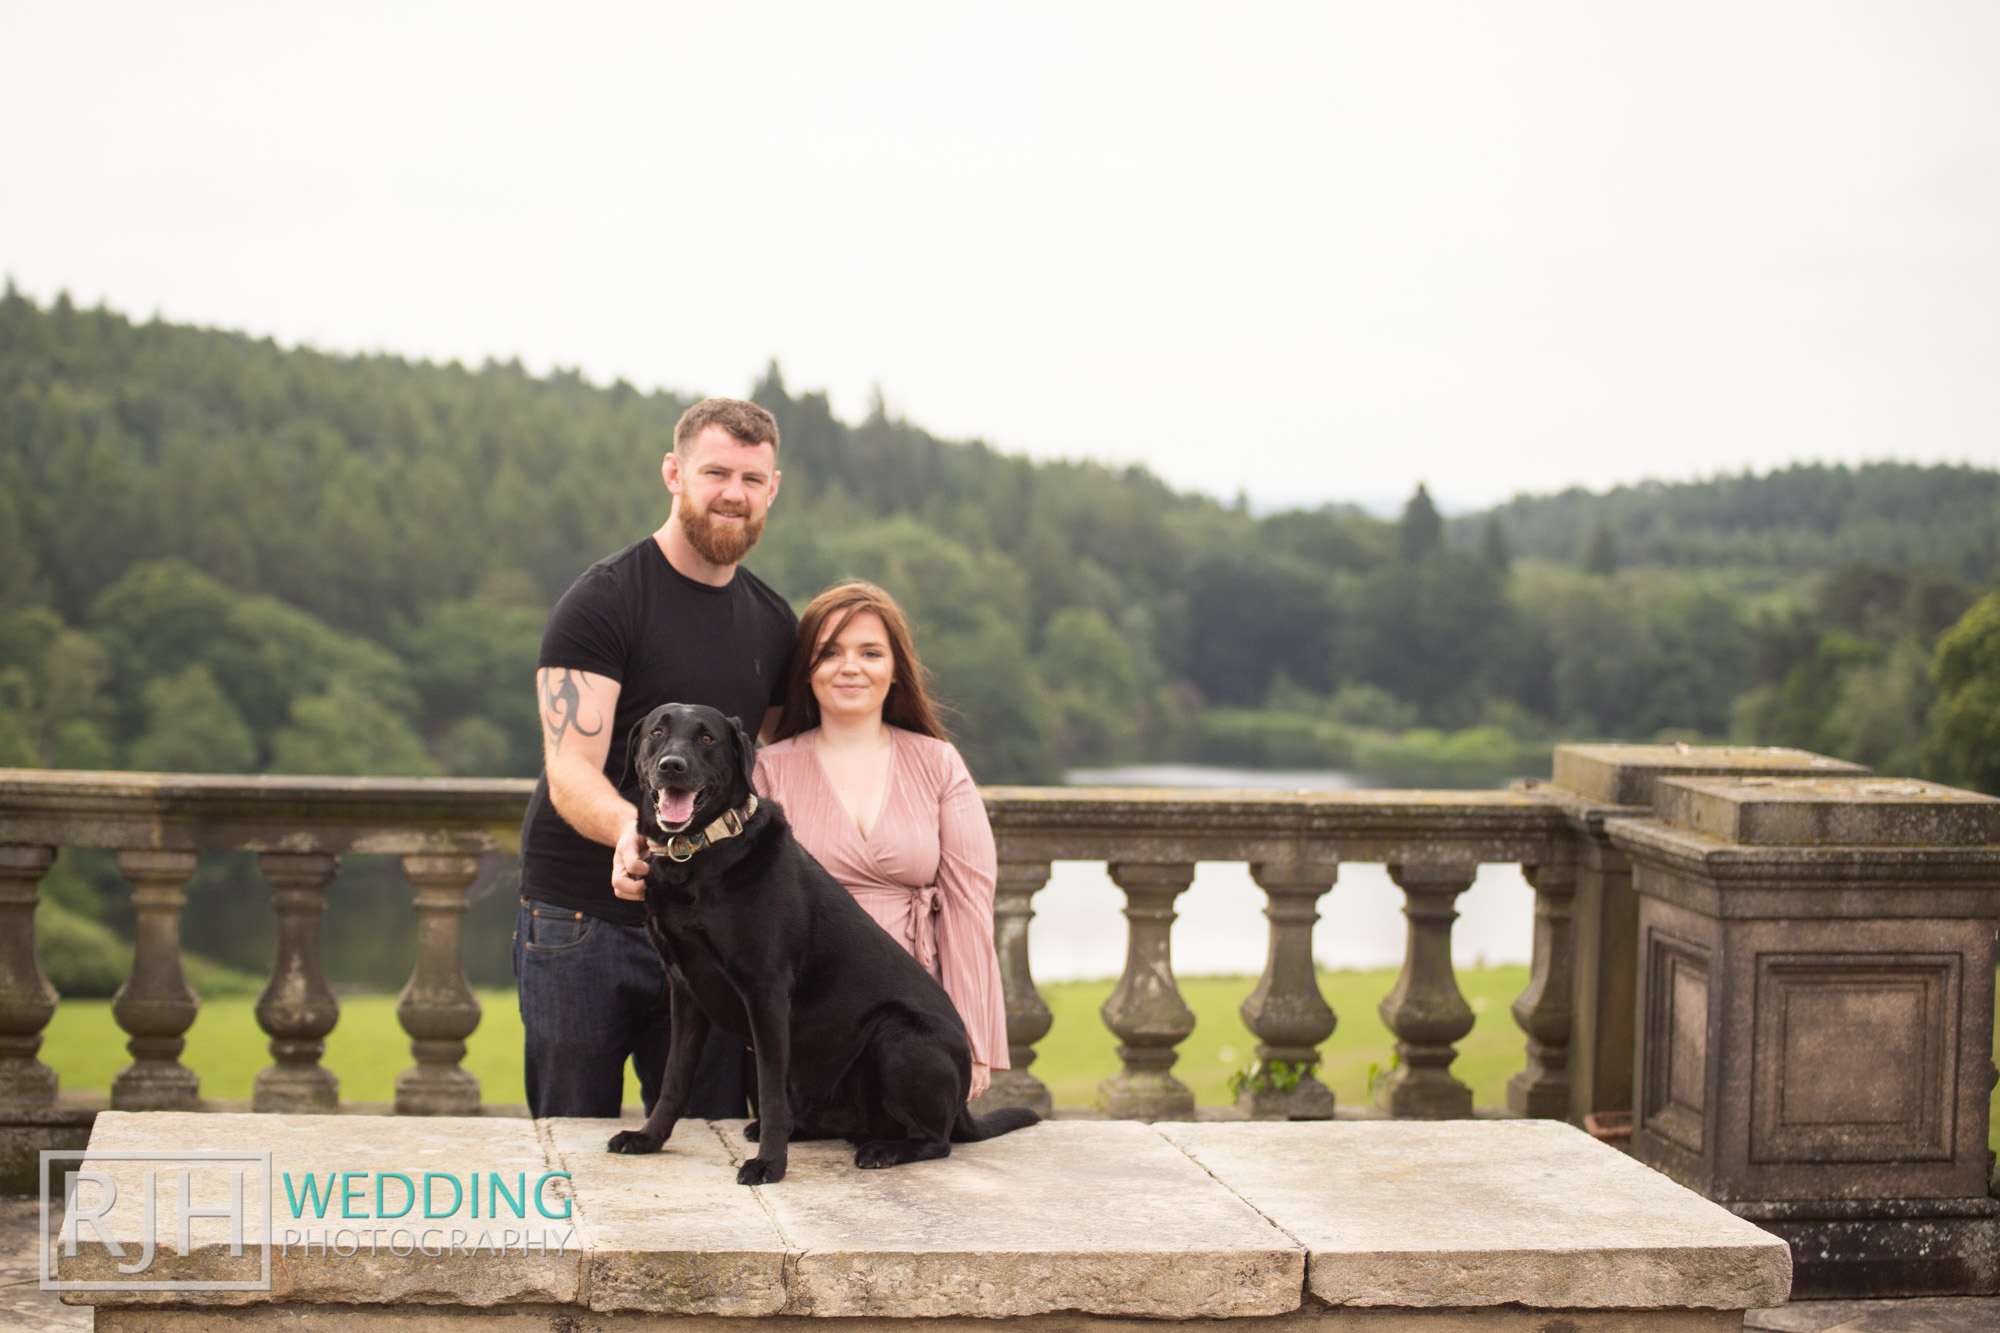 Osmaston Park Wedding Photographer - Jodie & Oli_001_IMG_7405.jpg